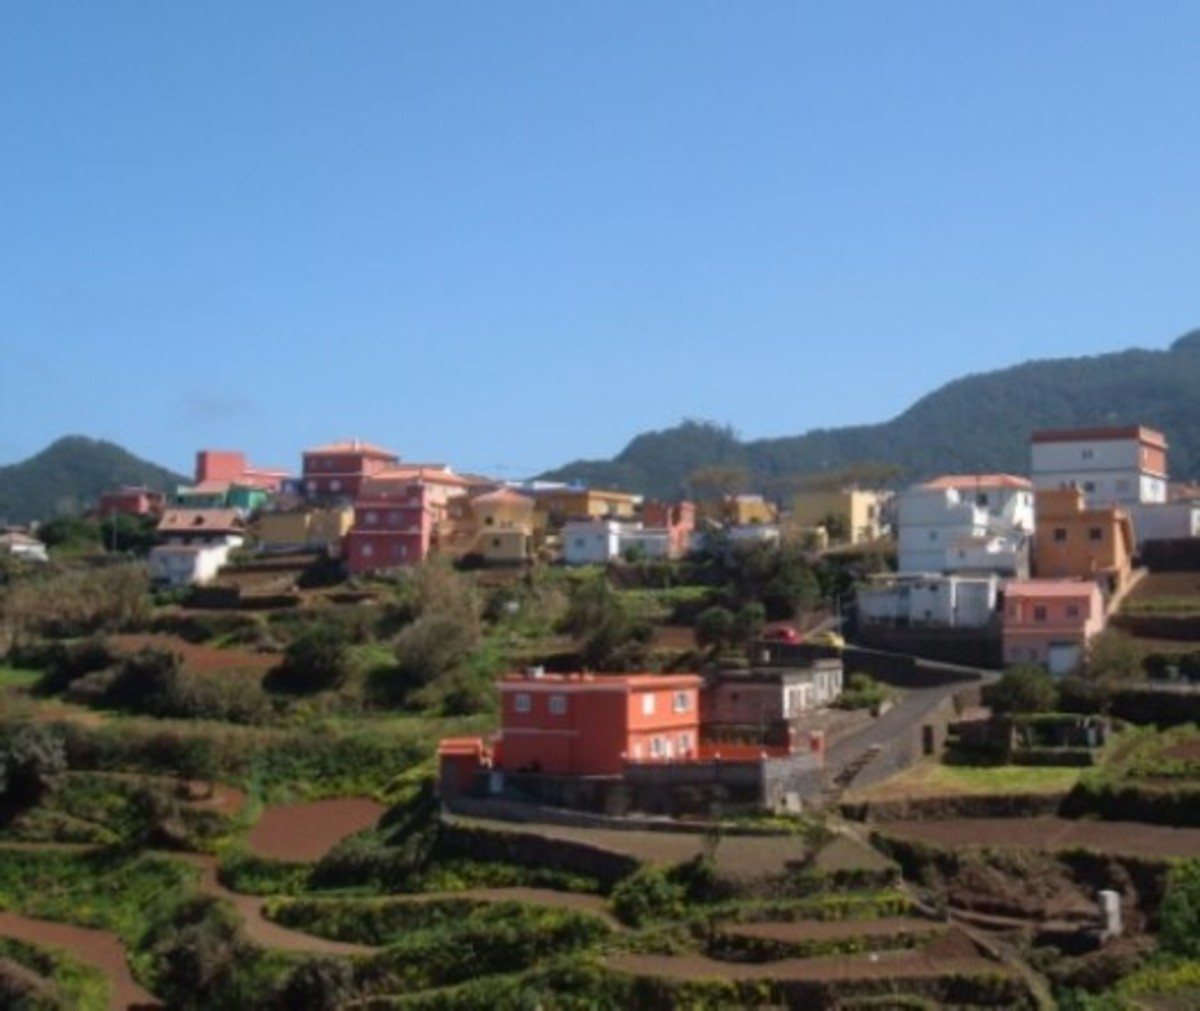 The remote Tenerife village of Las Carboneras. Photo by Steve Andrews